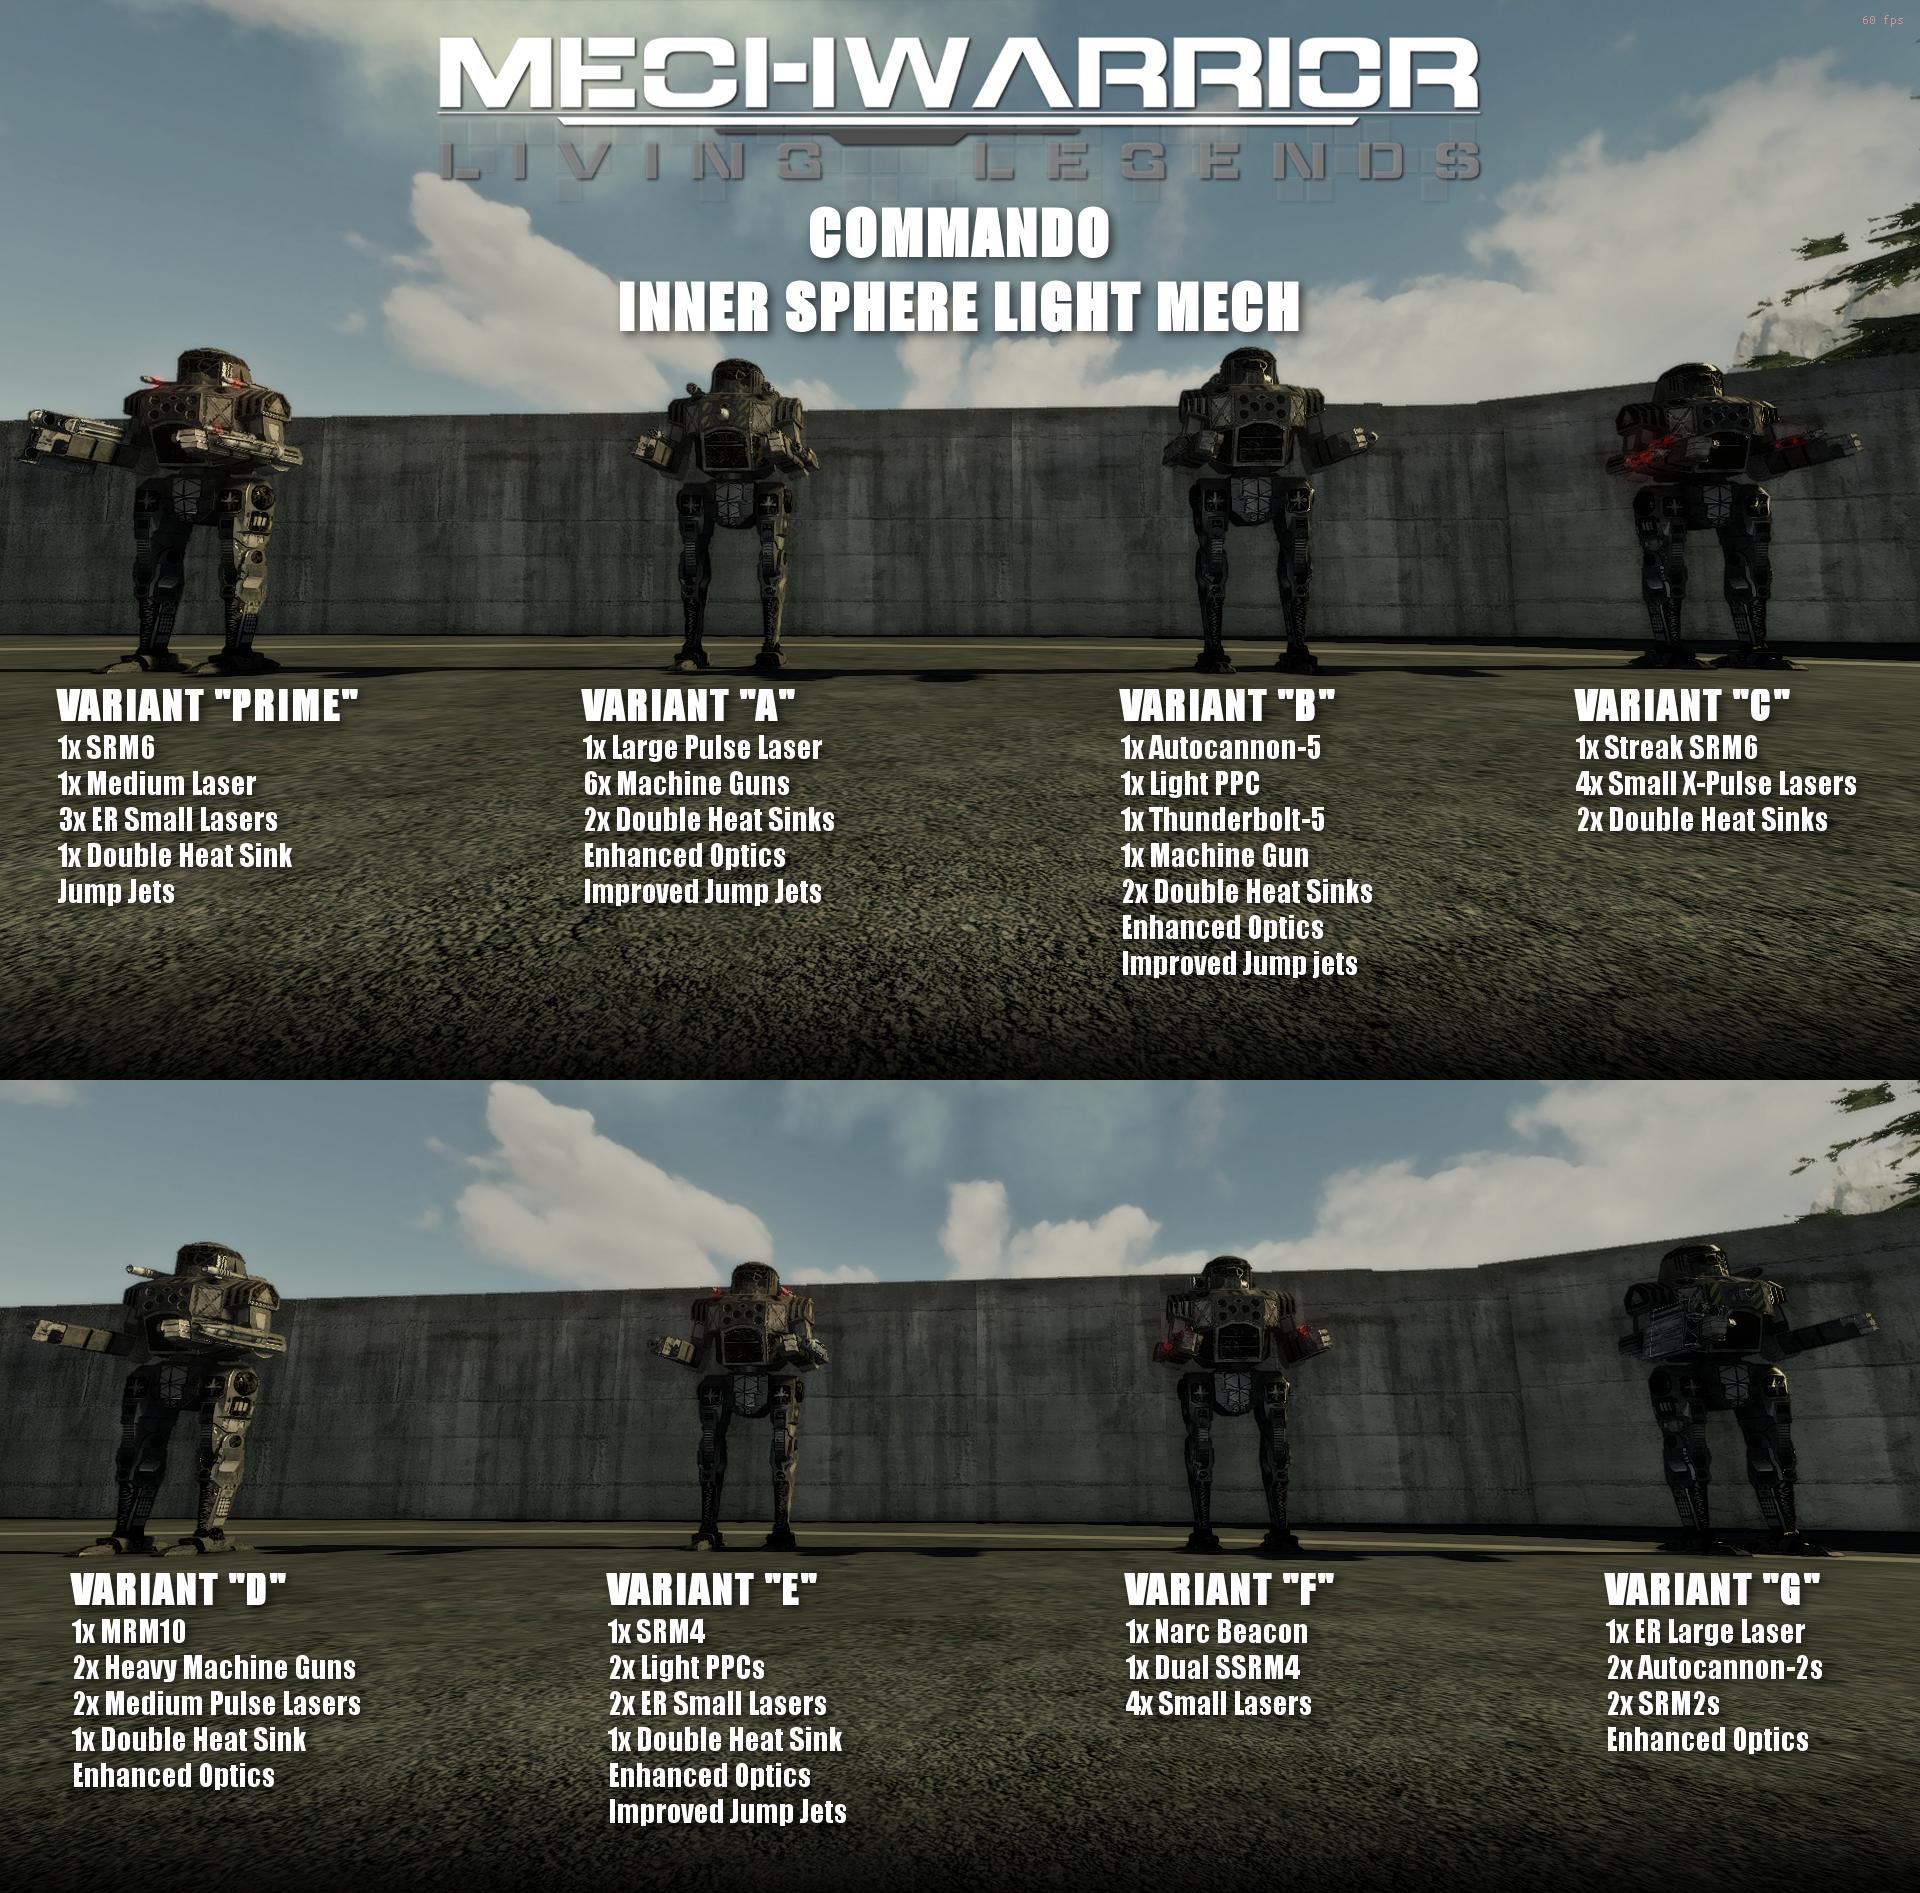 Commando Variants